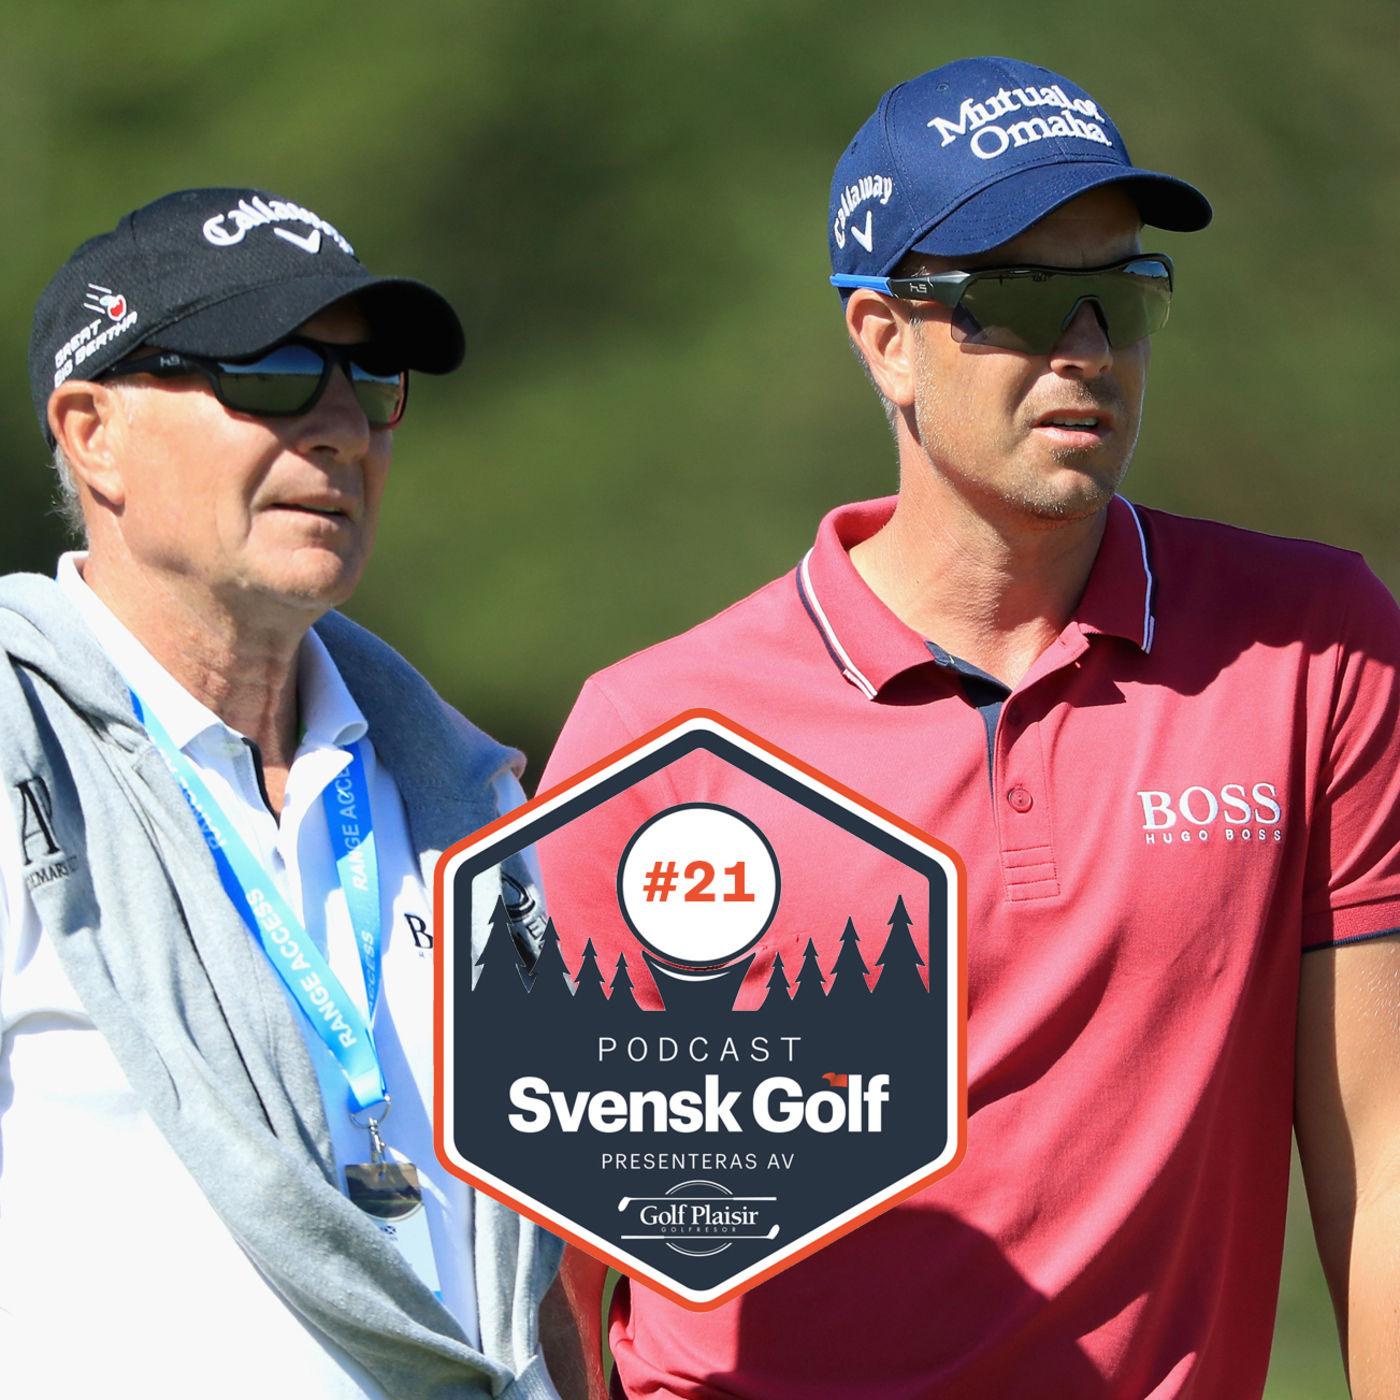 Svensk Golf Podcast